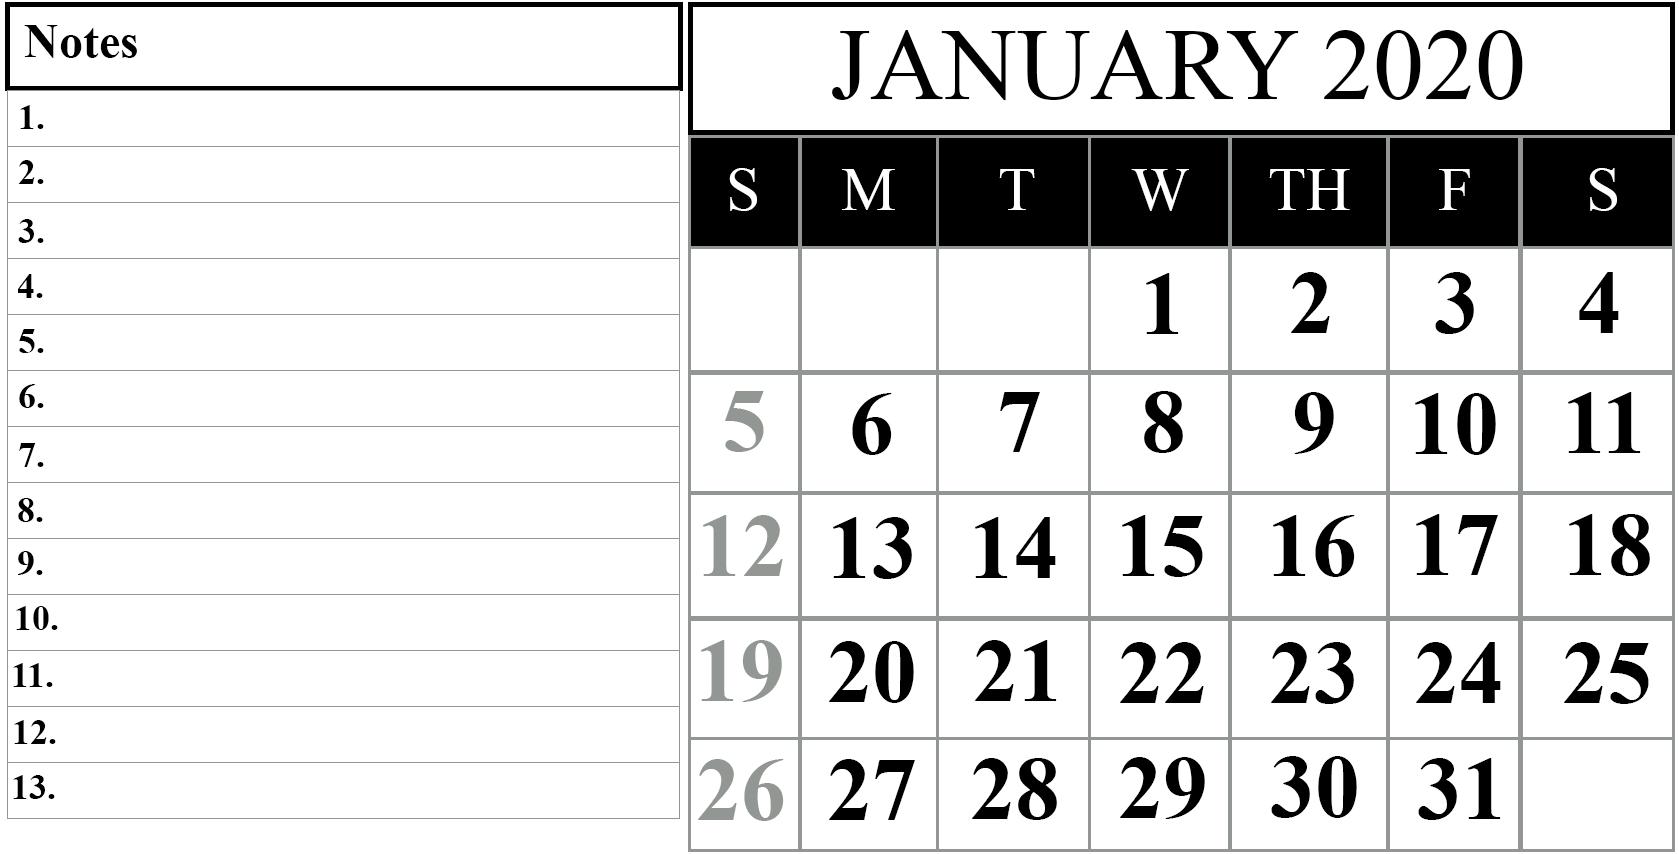 January 2020 Blank Calendar